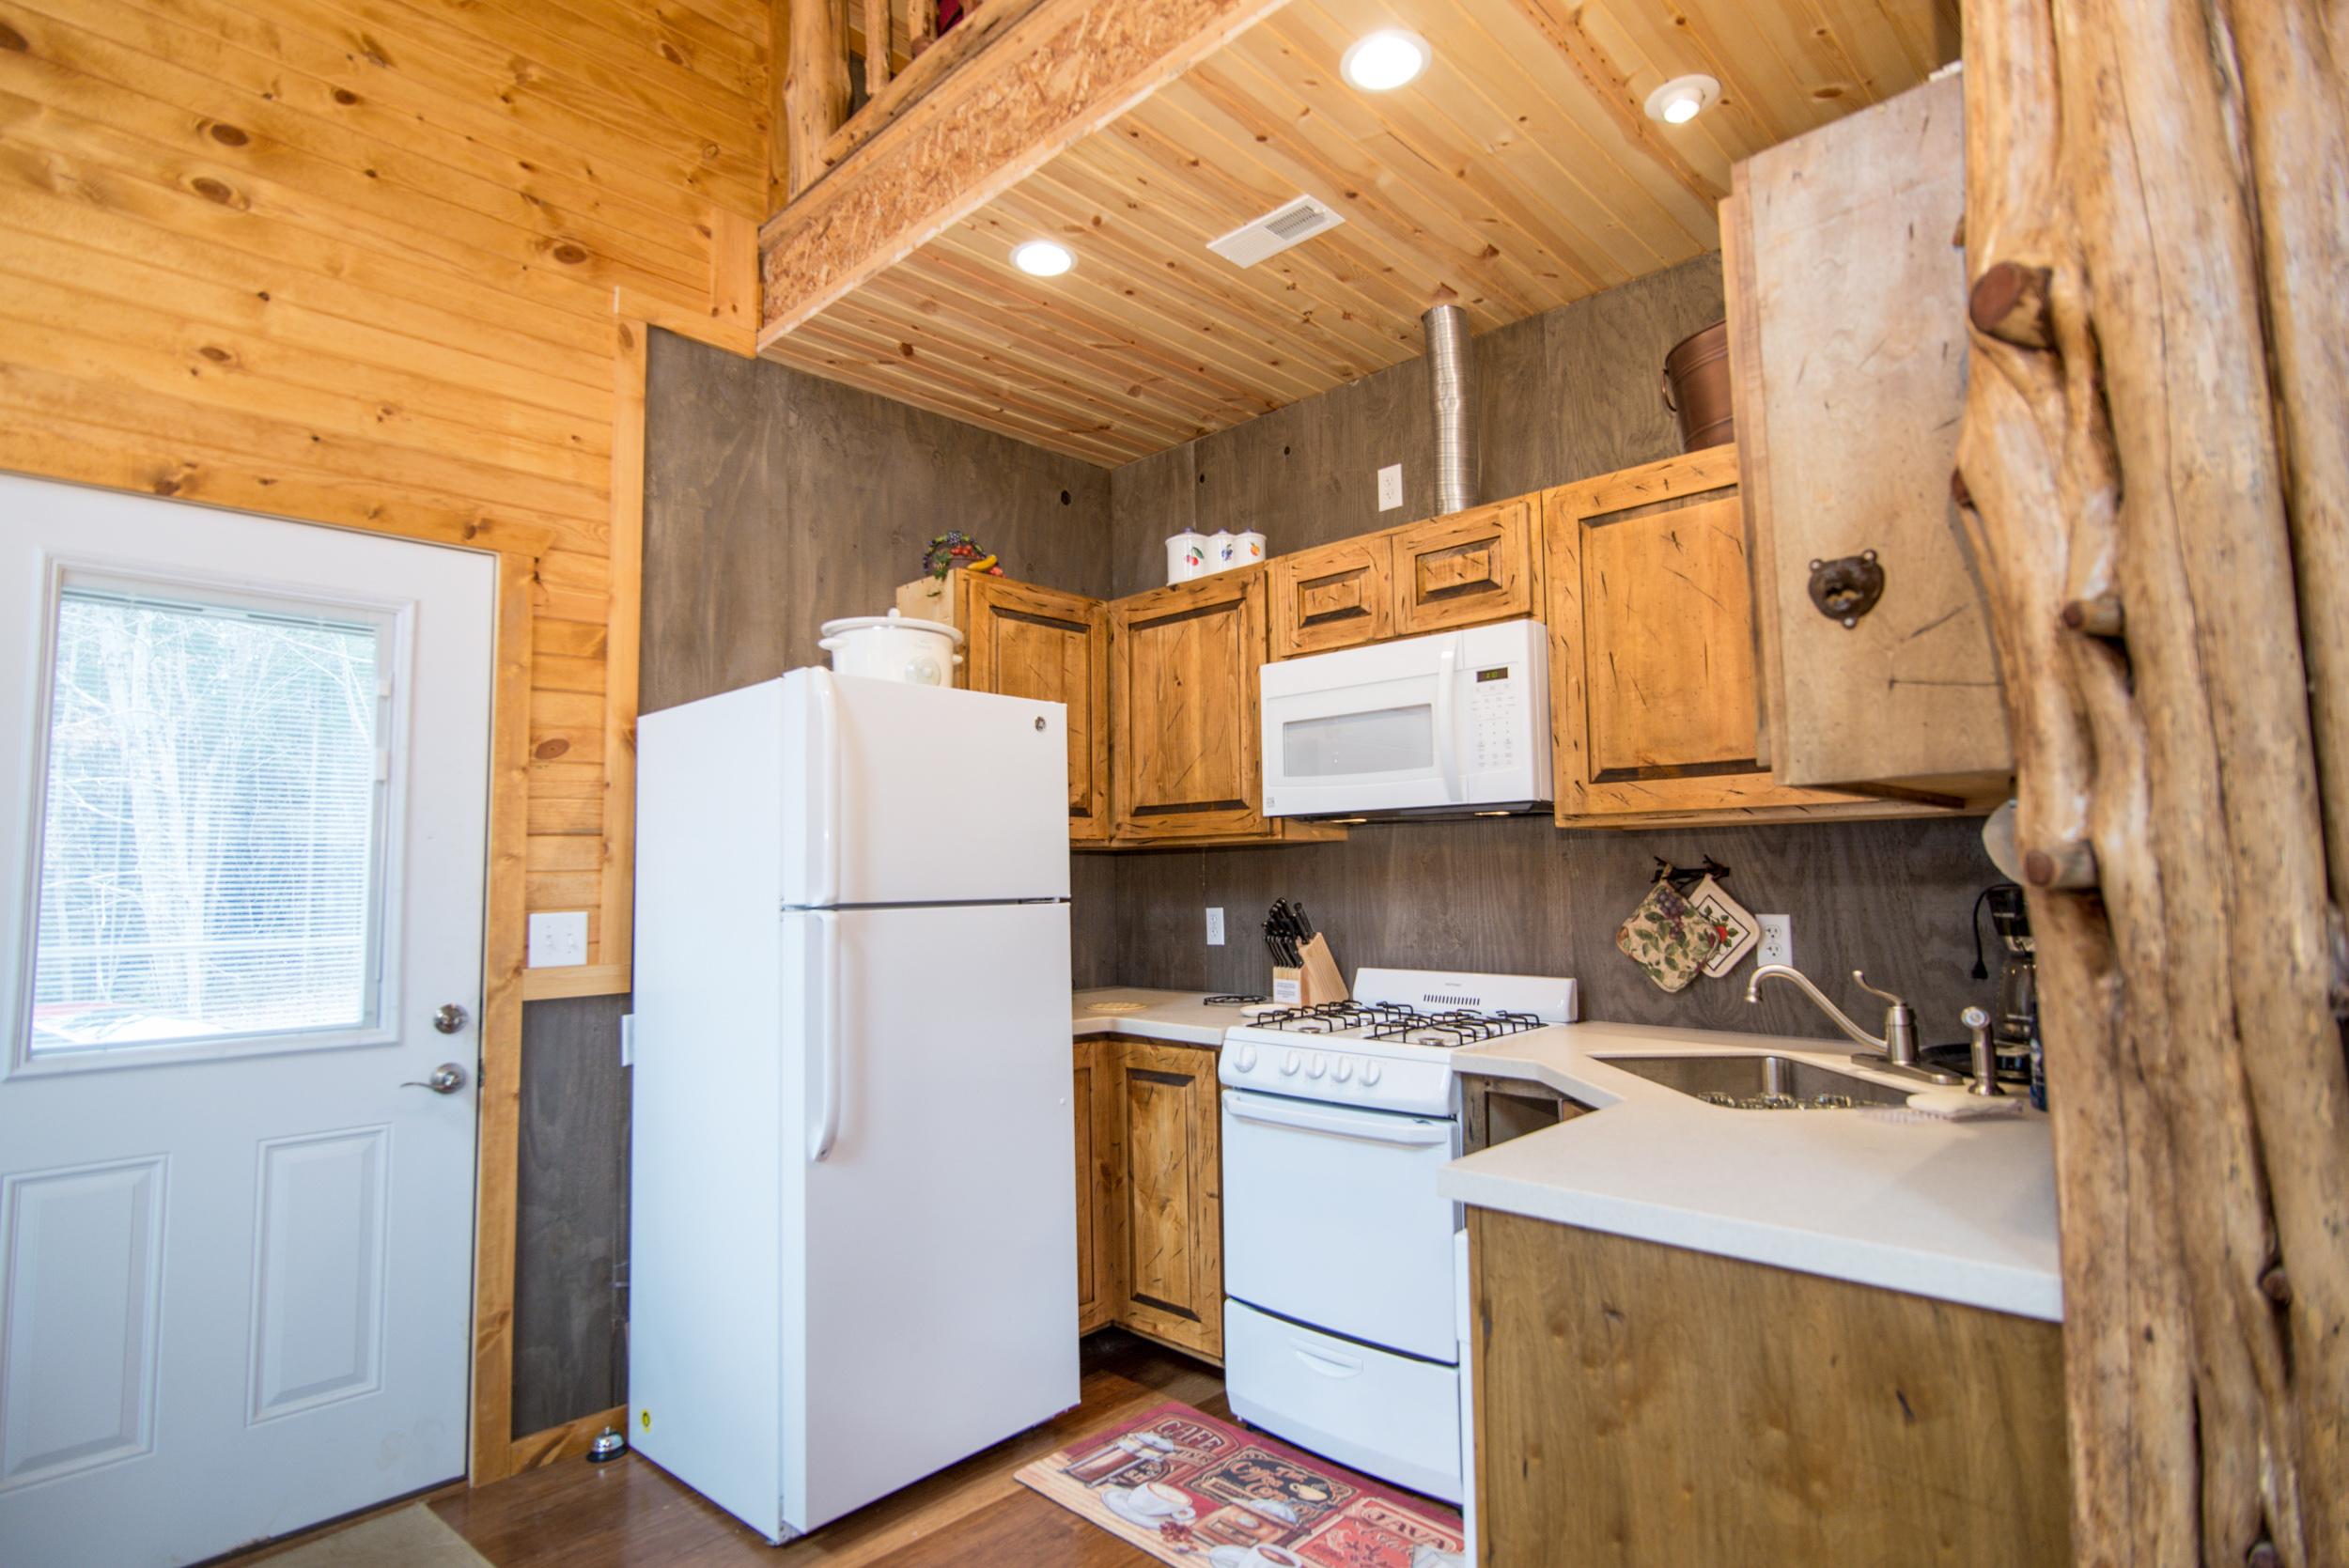 Hopewell Croft Kitchen - Adams County Cabin Rental